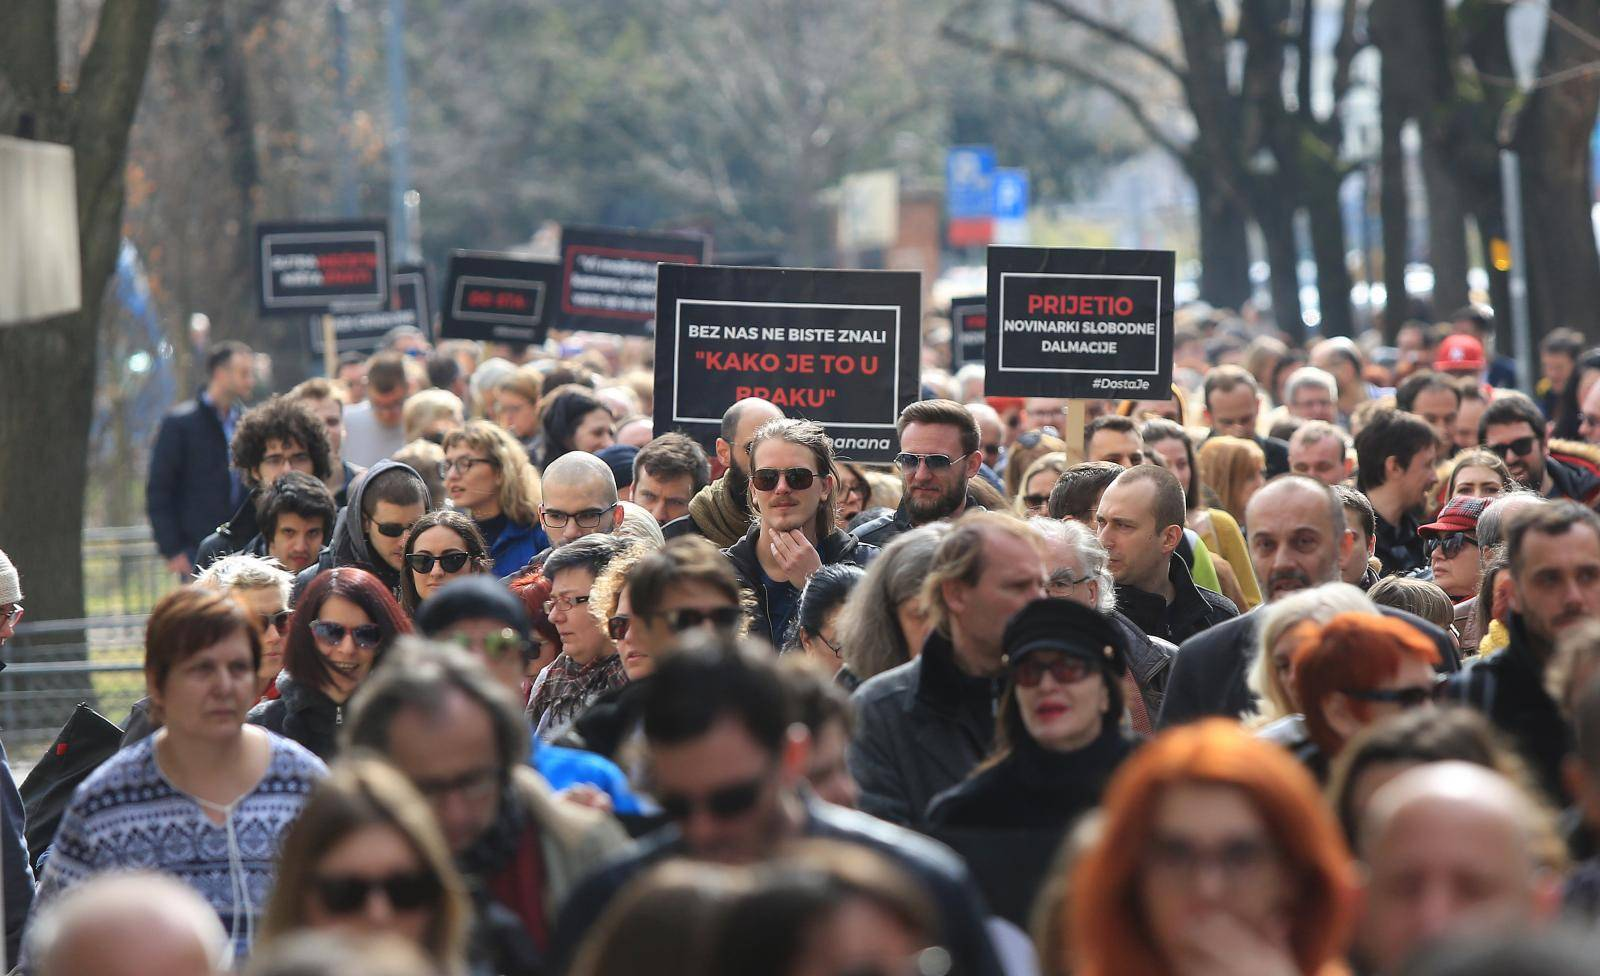 Veliki prosvjed protiv cenzure: Dosta je bilo progona novinara!